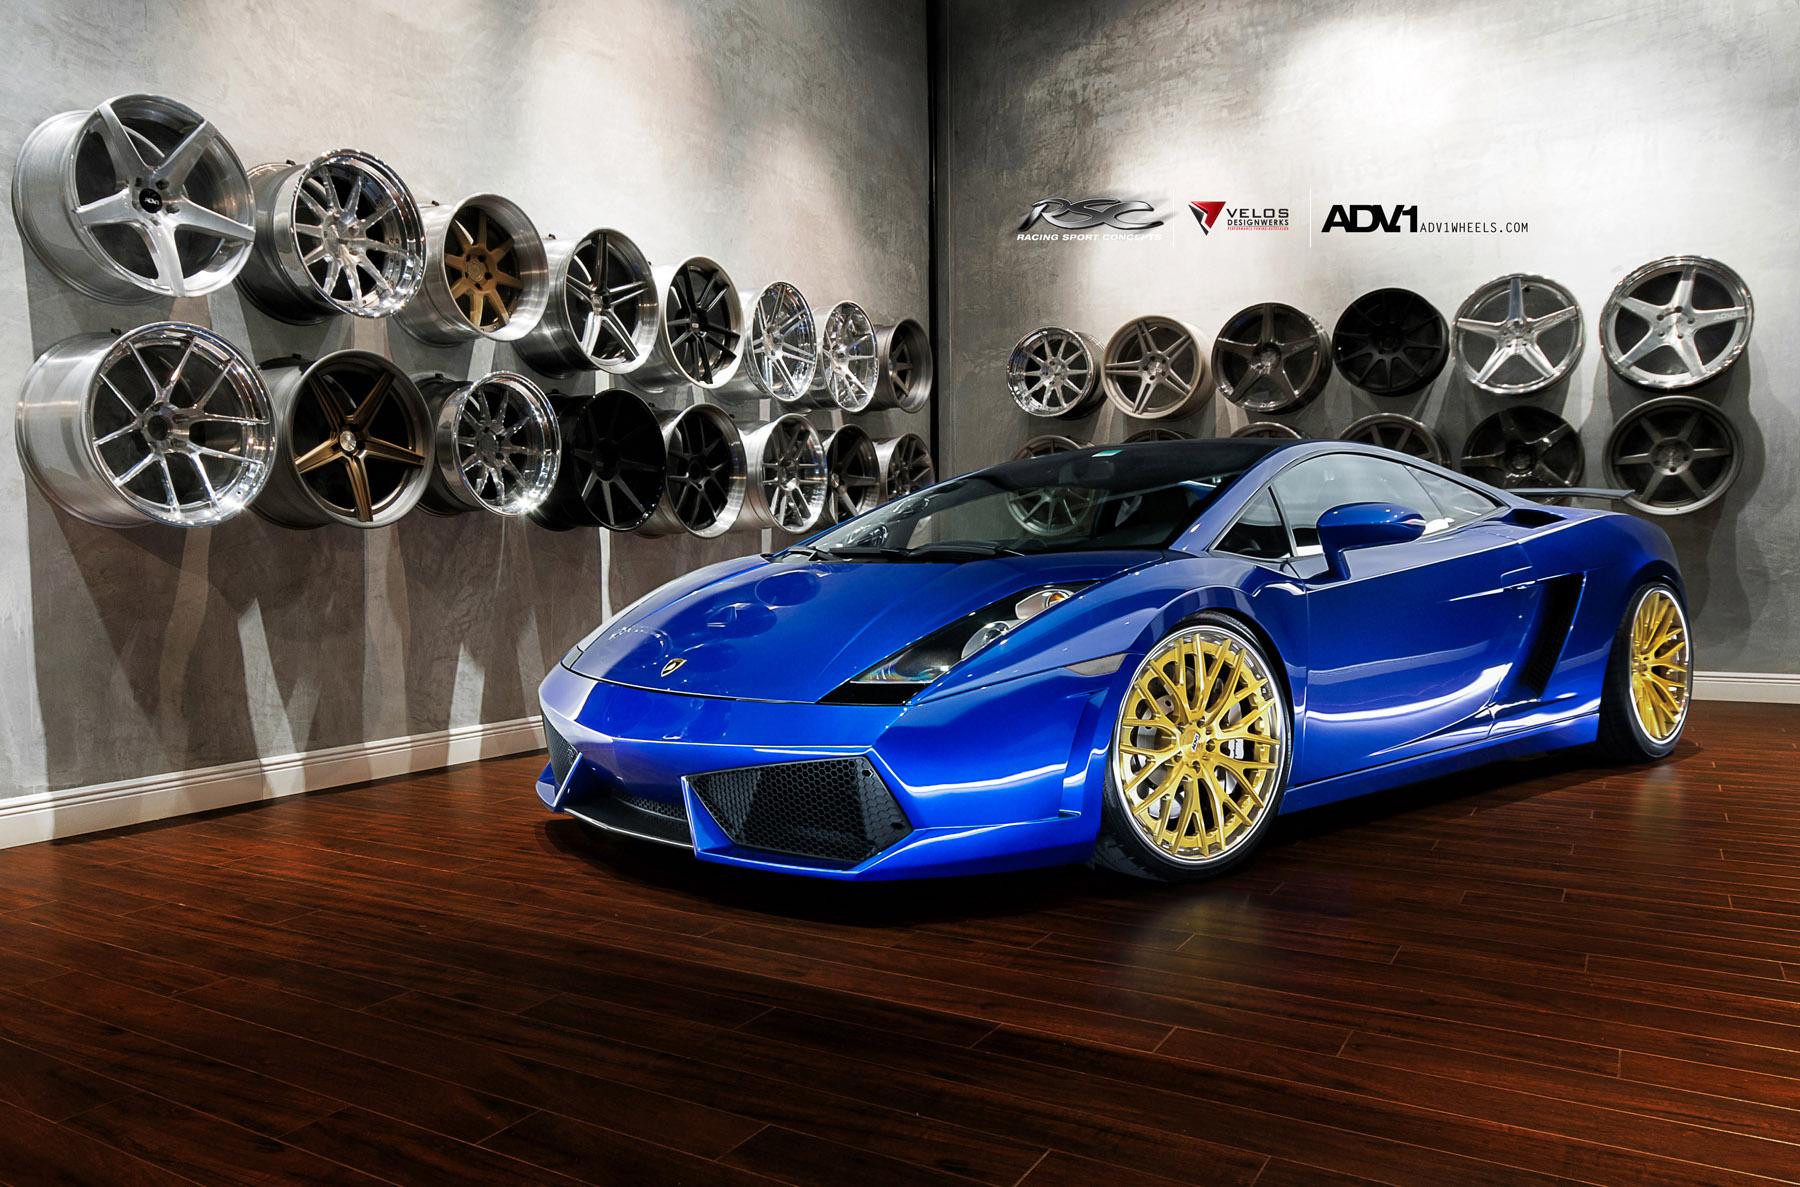 Adv 1 Wheels Lamborghini Gallardo Adv10 0ts Sl Gold Edition